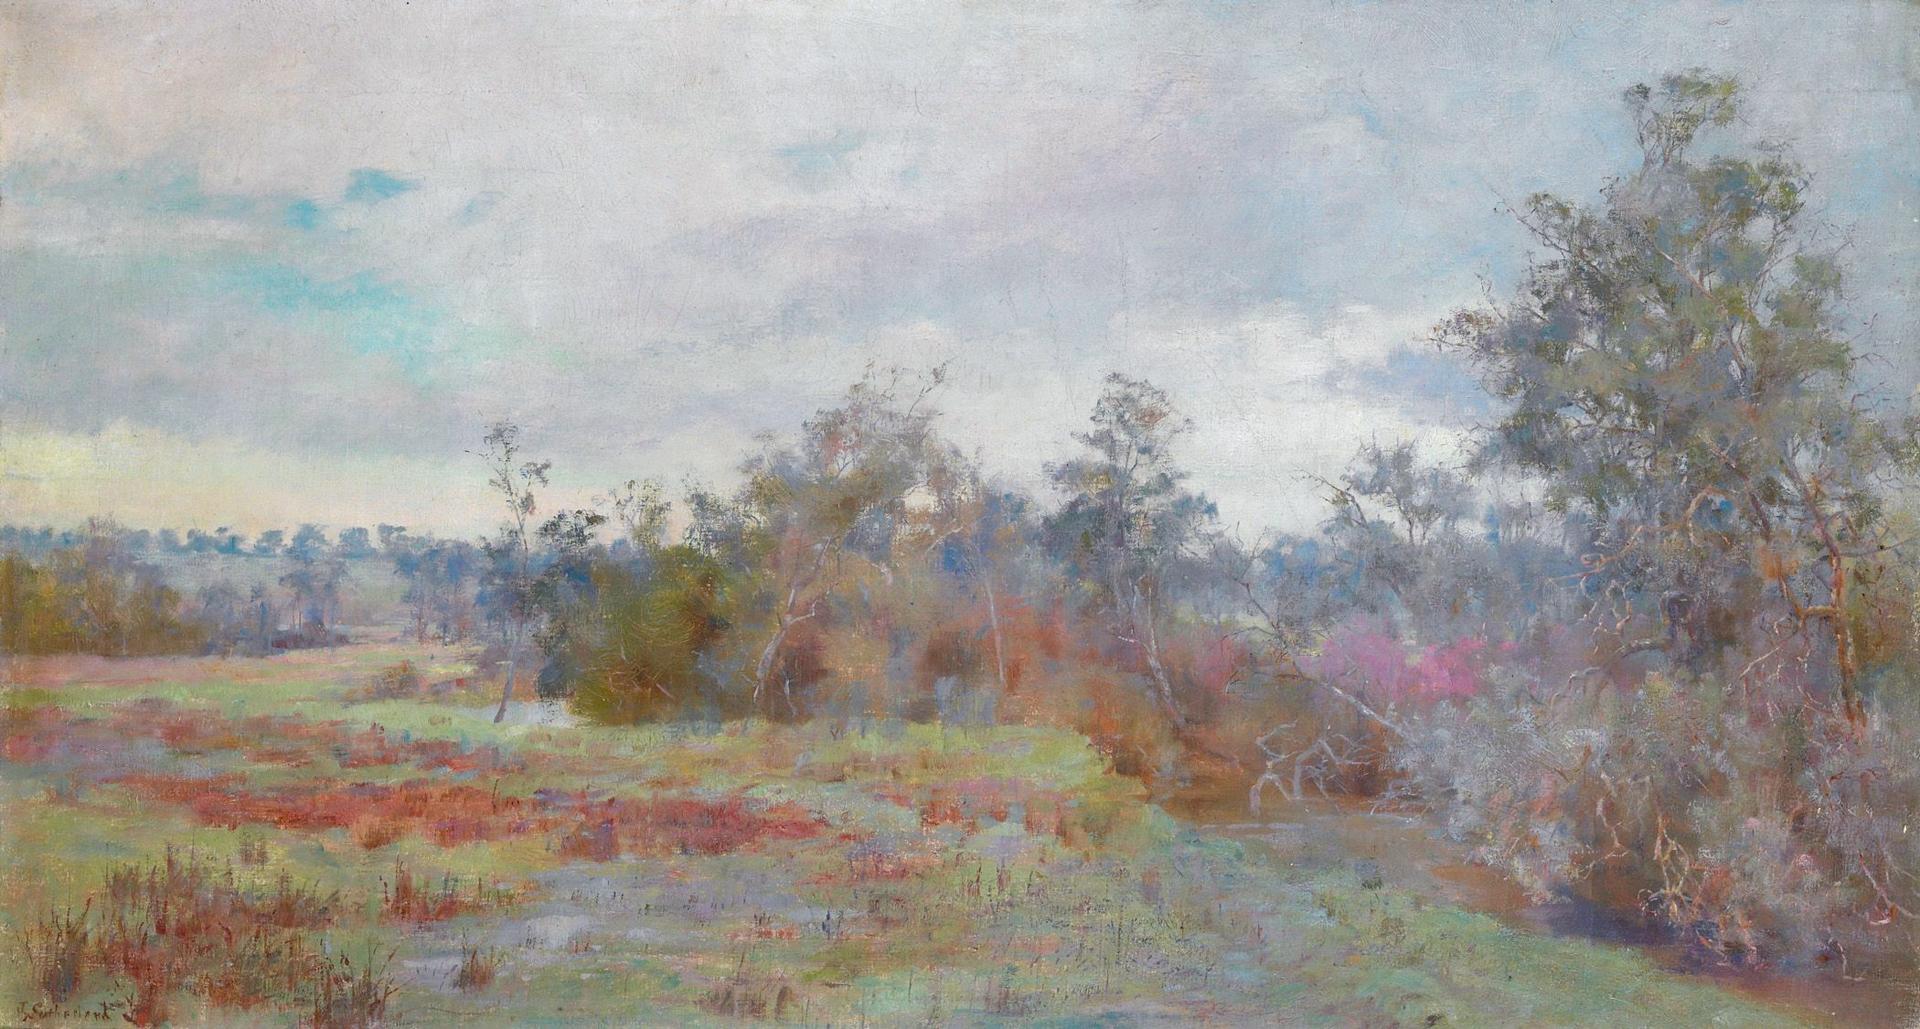 jane_sutherland_-_after_autumn_rain